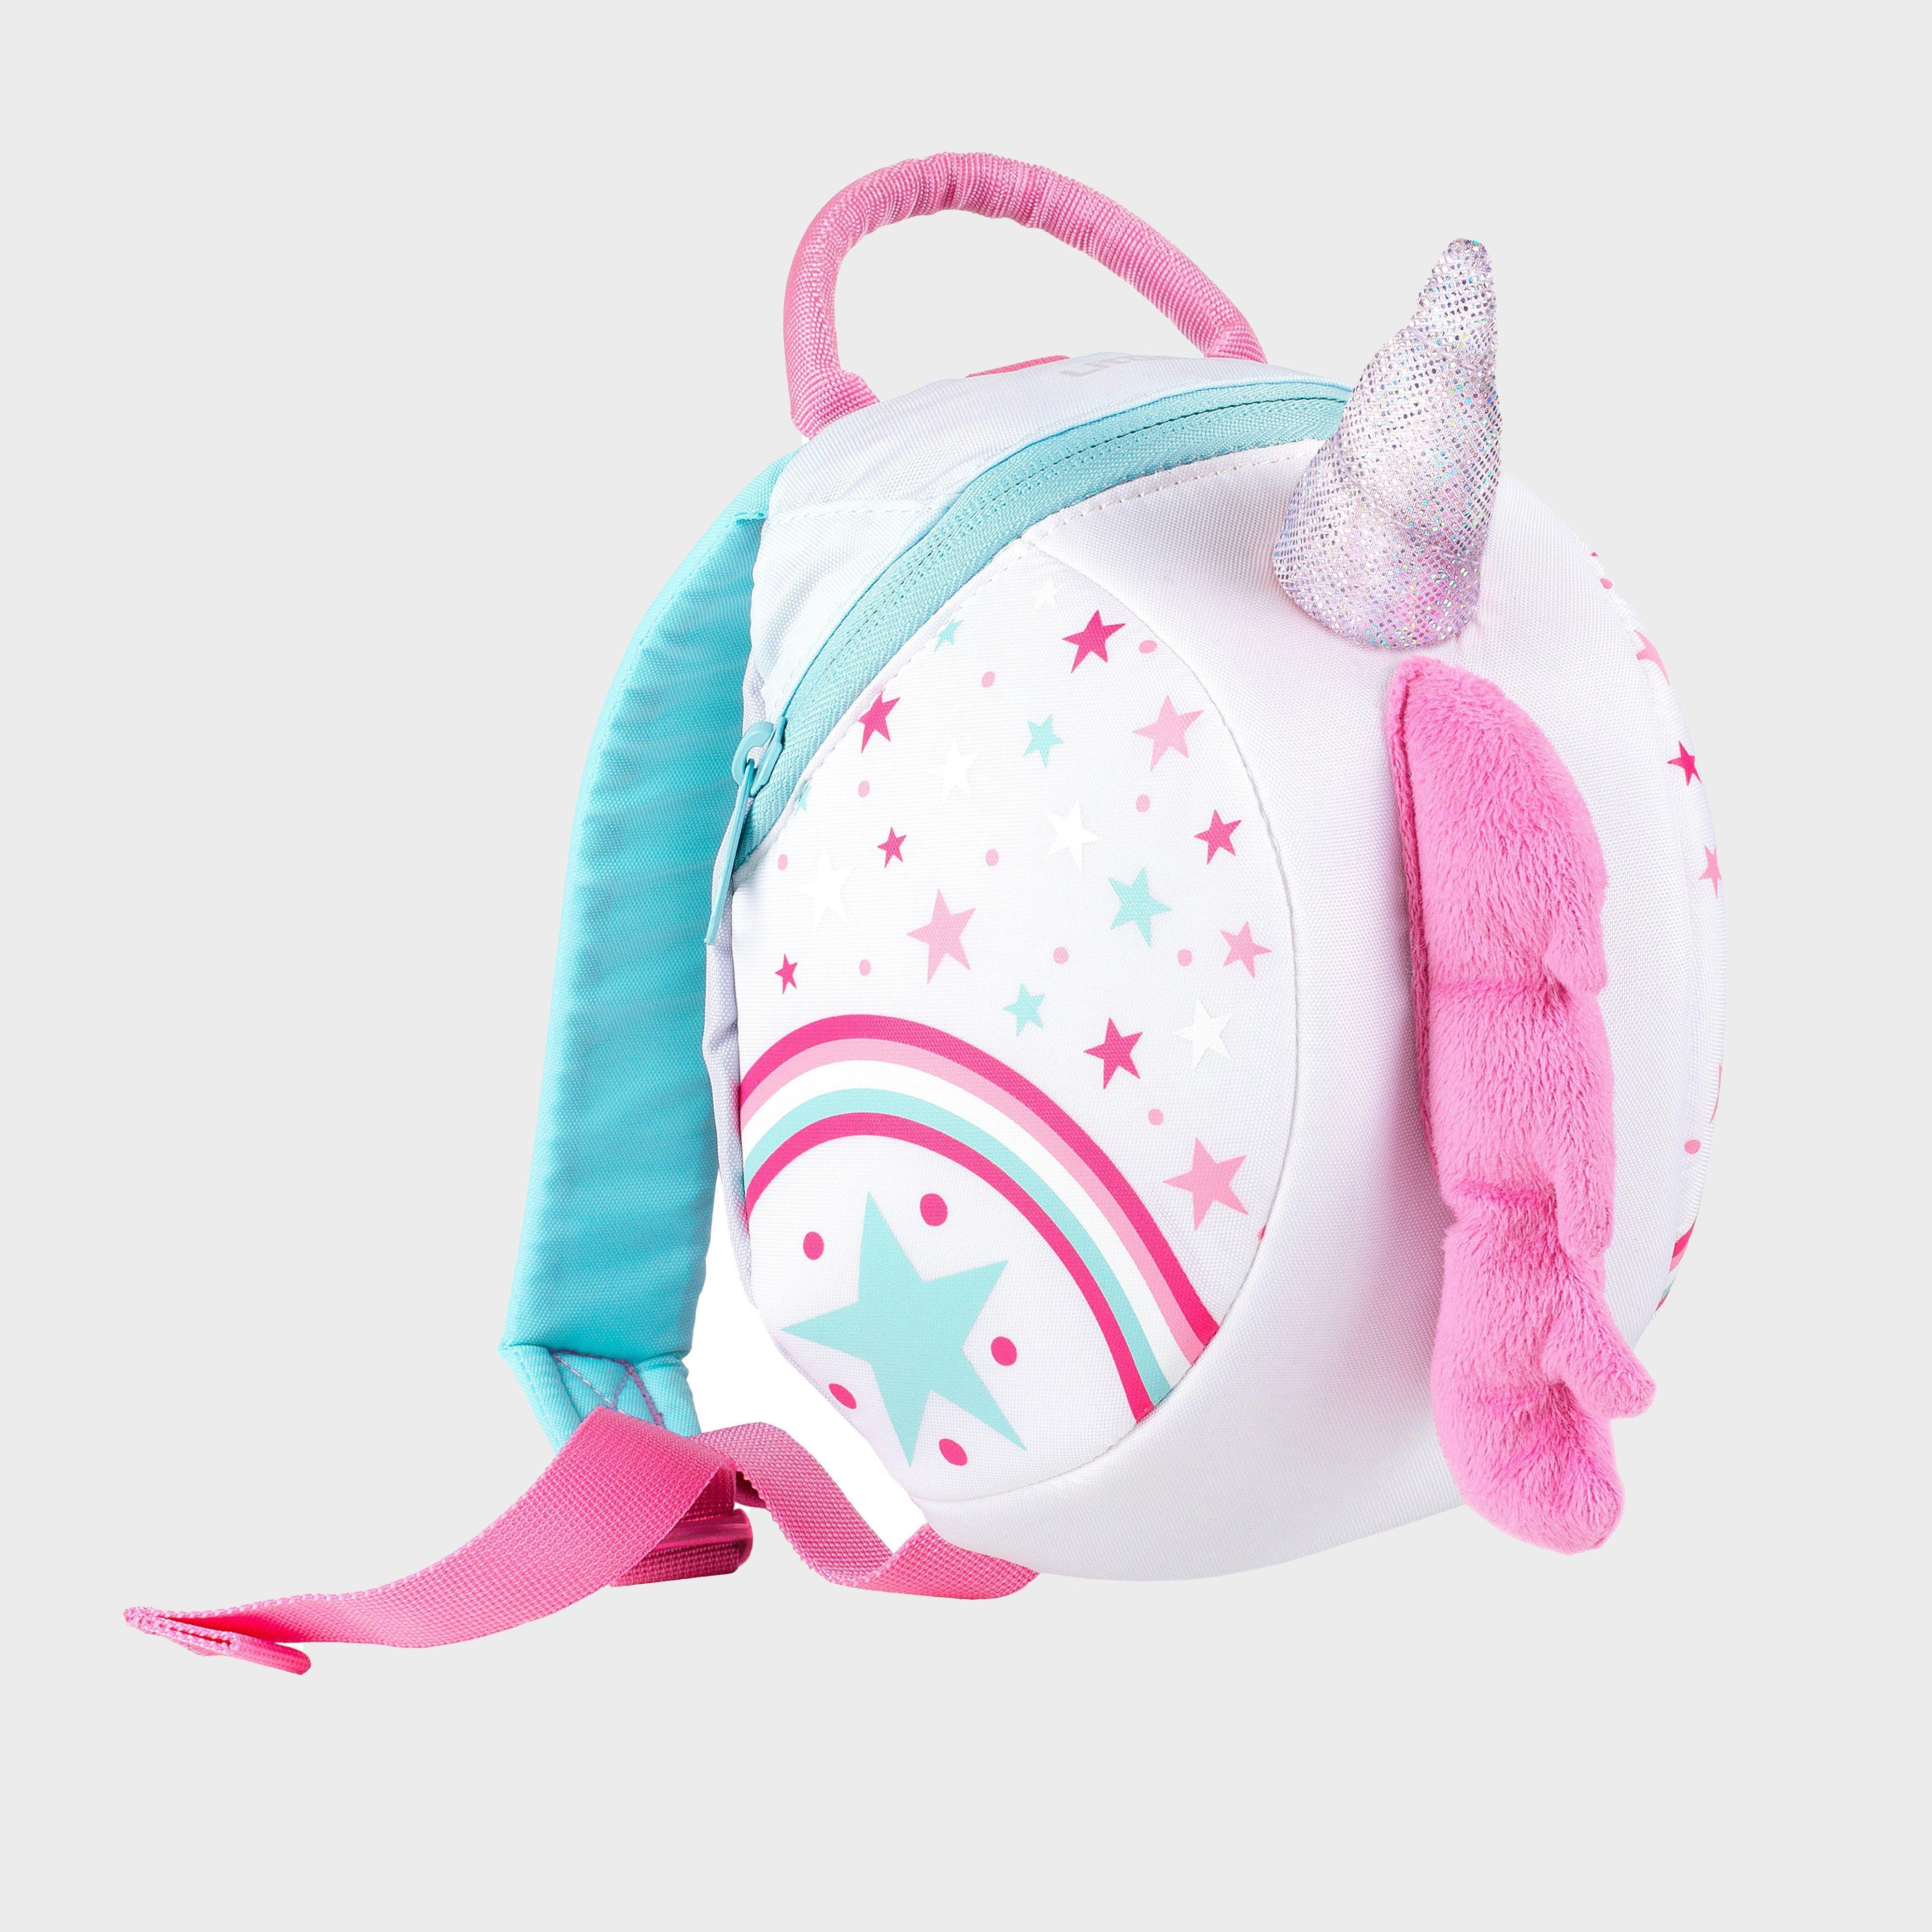 Littlelife Littlelife Unicorn Toddler Pack with Rein - White, White